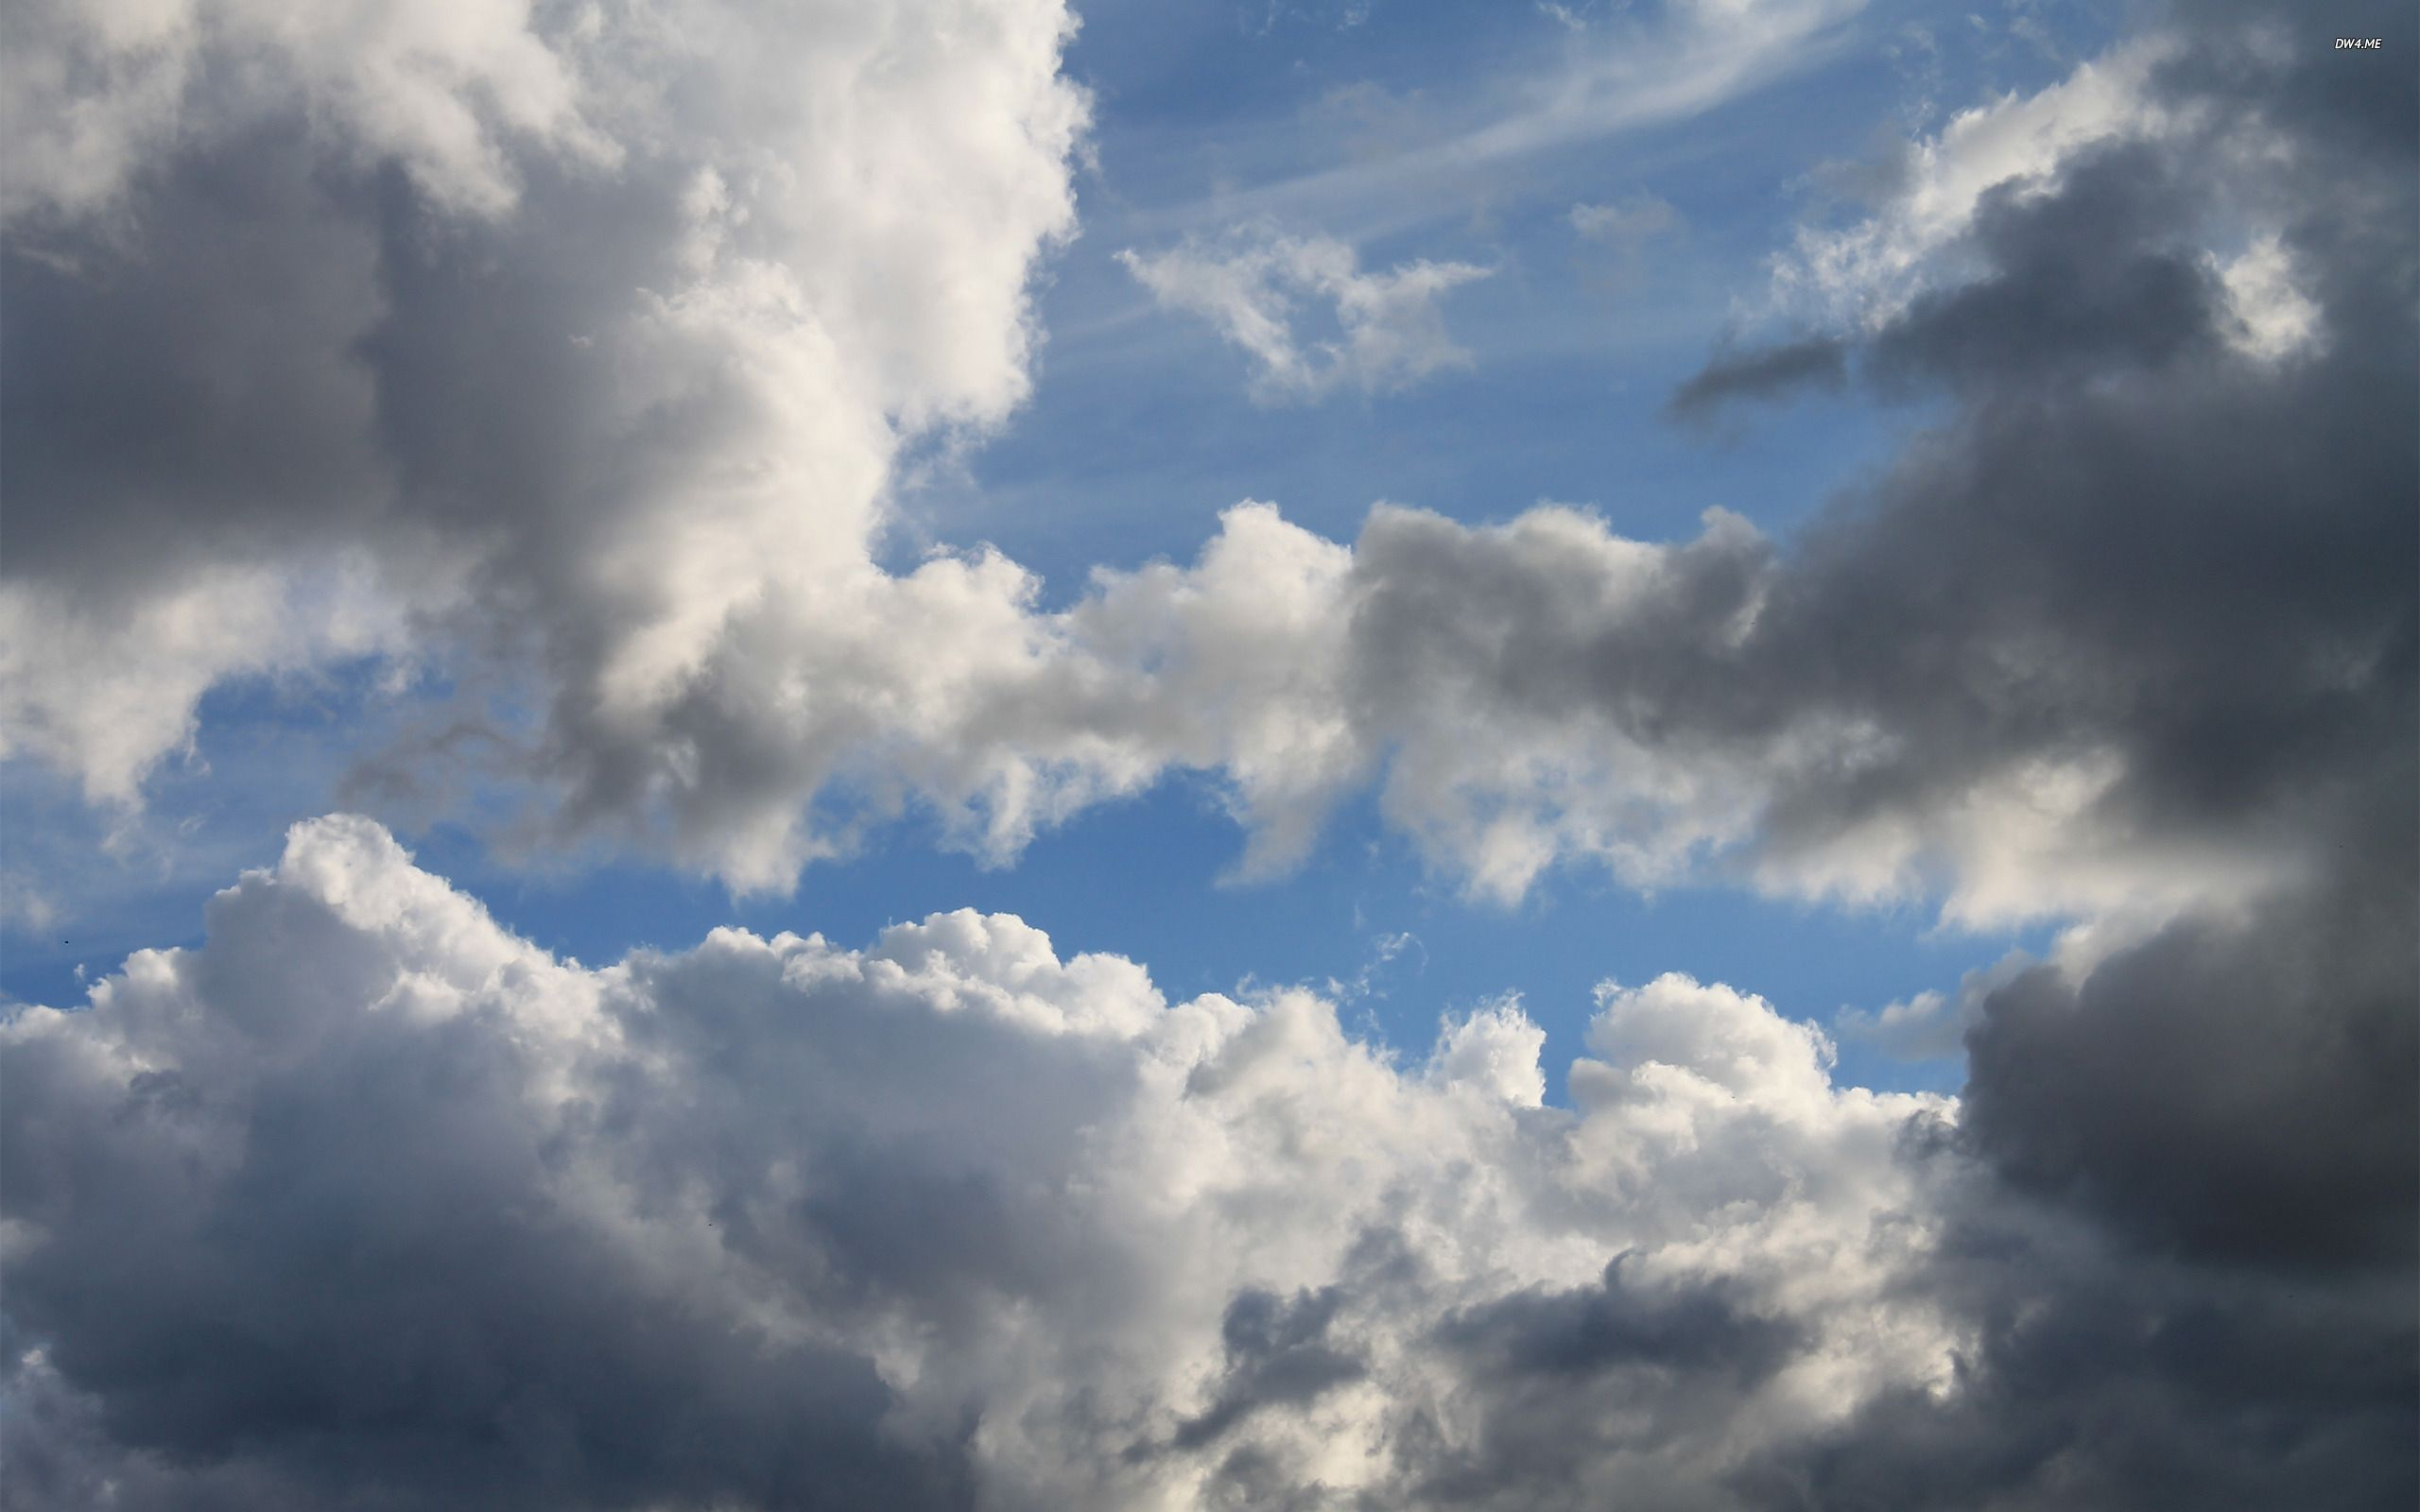 Clouds k ultra hd wallpapers hd desktop backgrounds